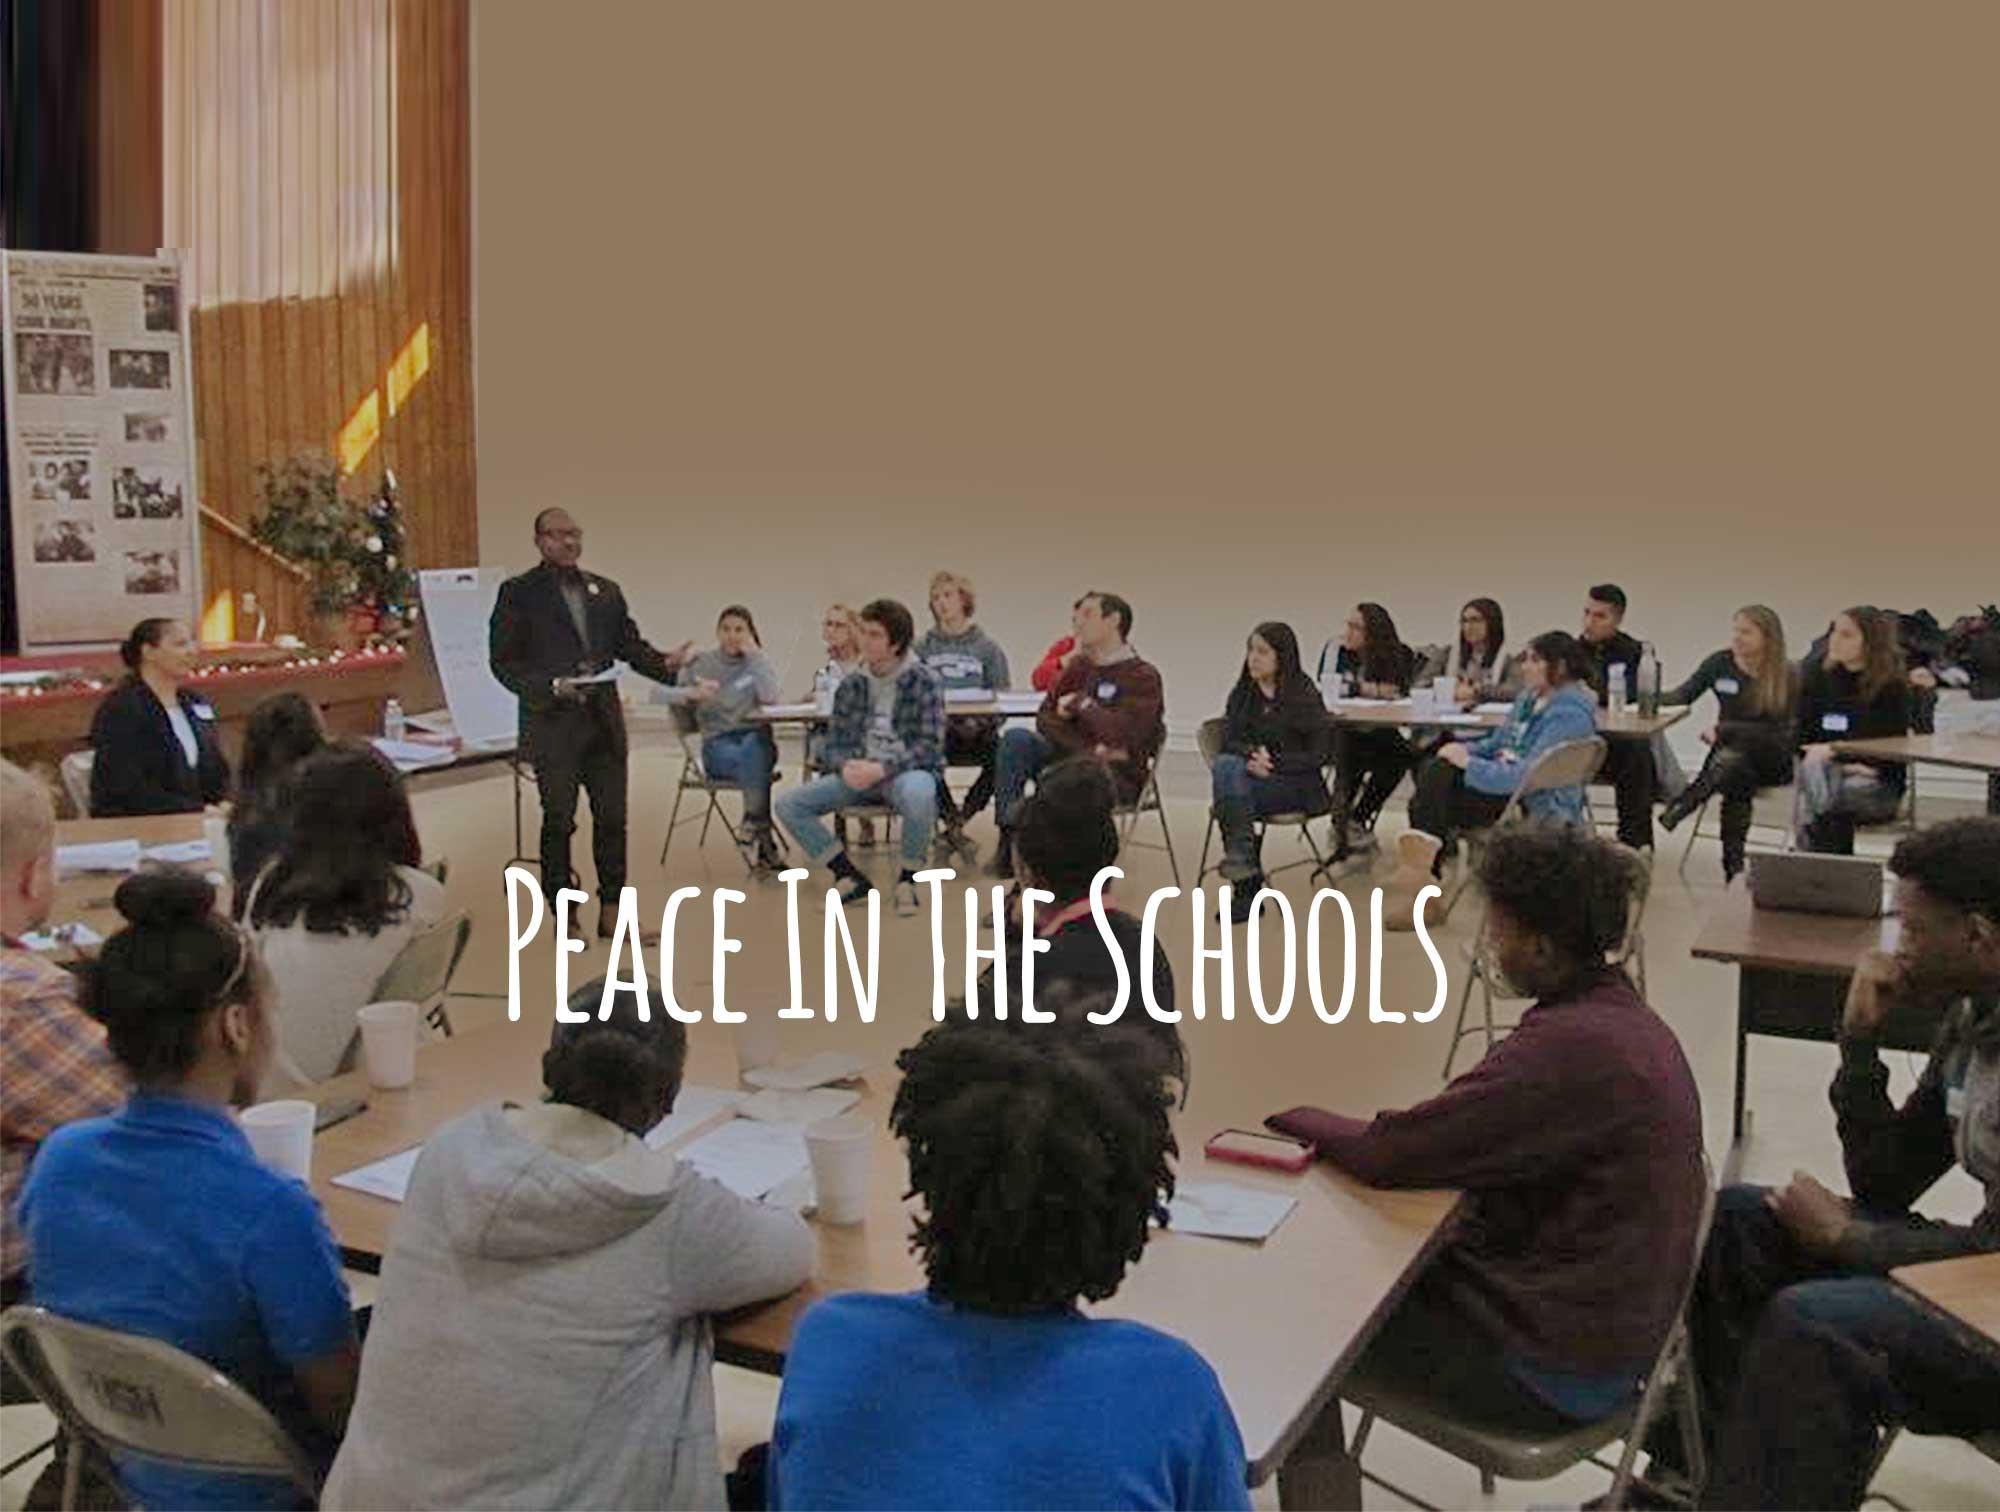 awc-slide-peace-schools.jpg